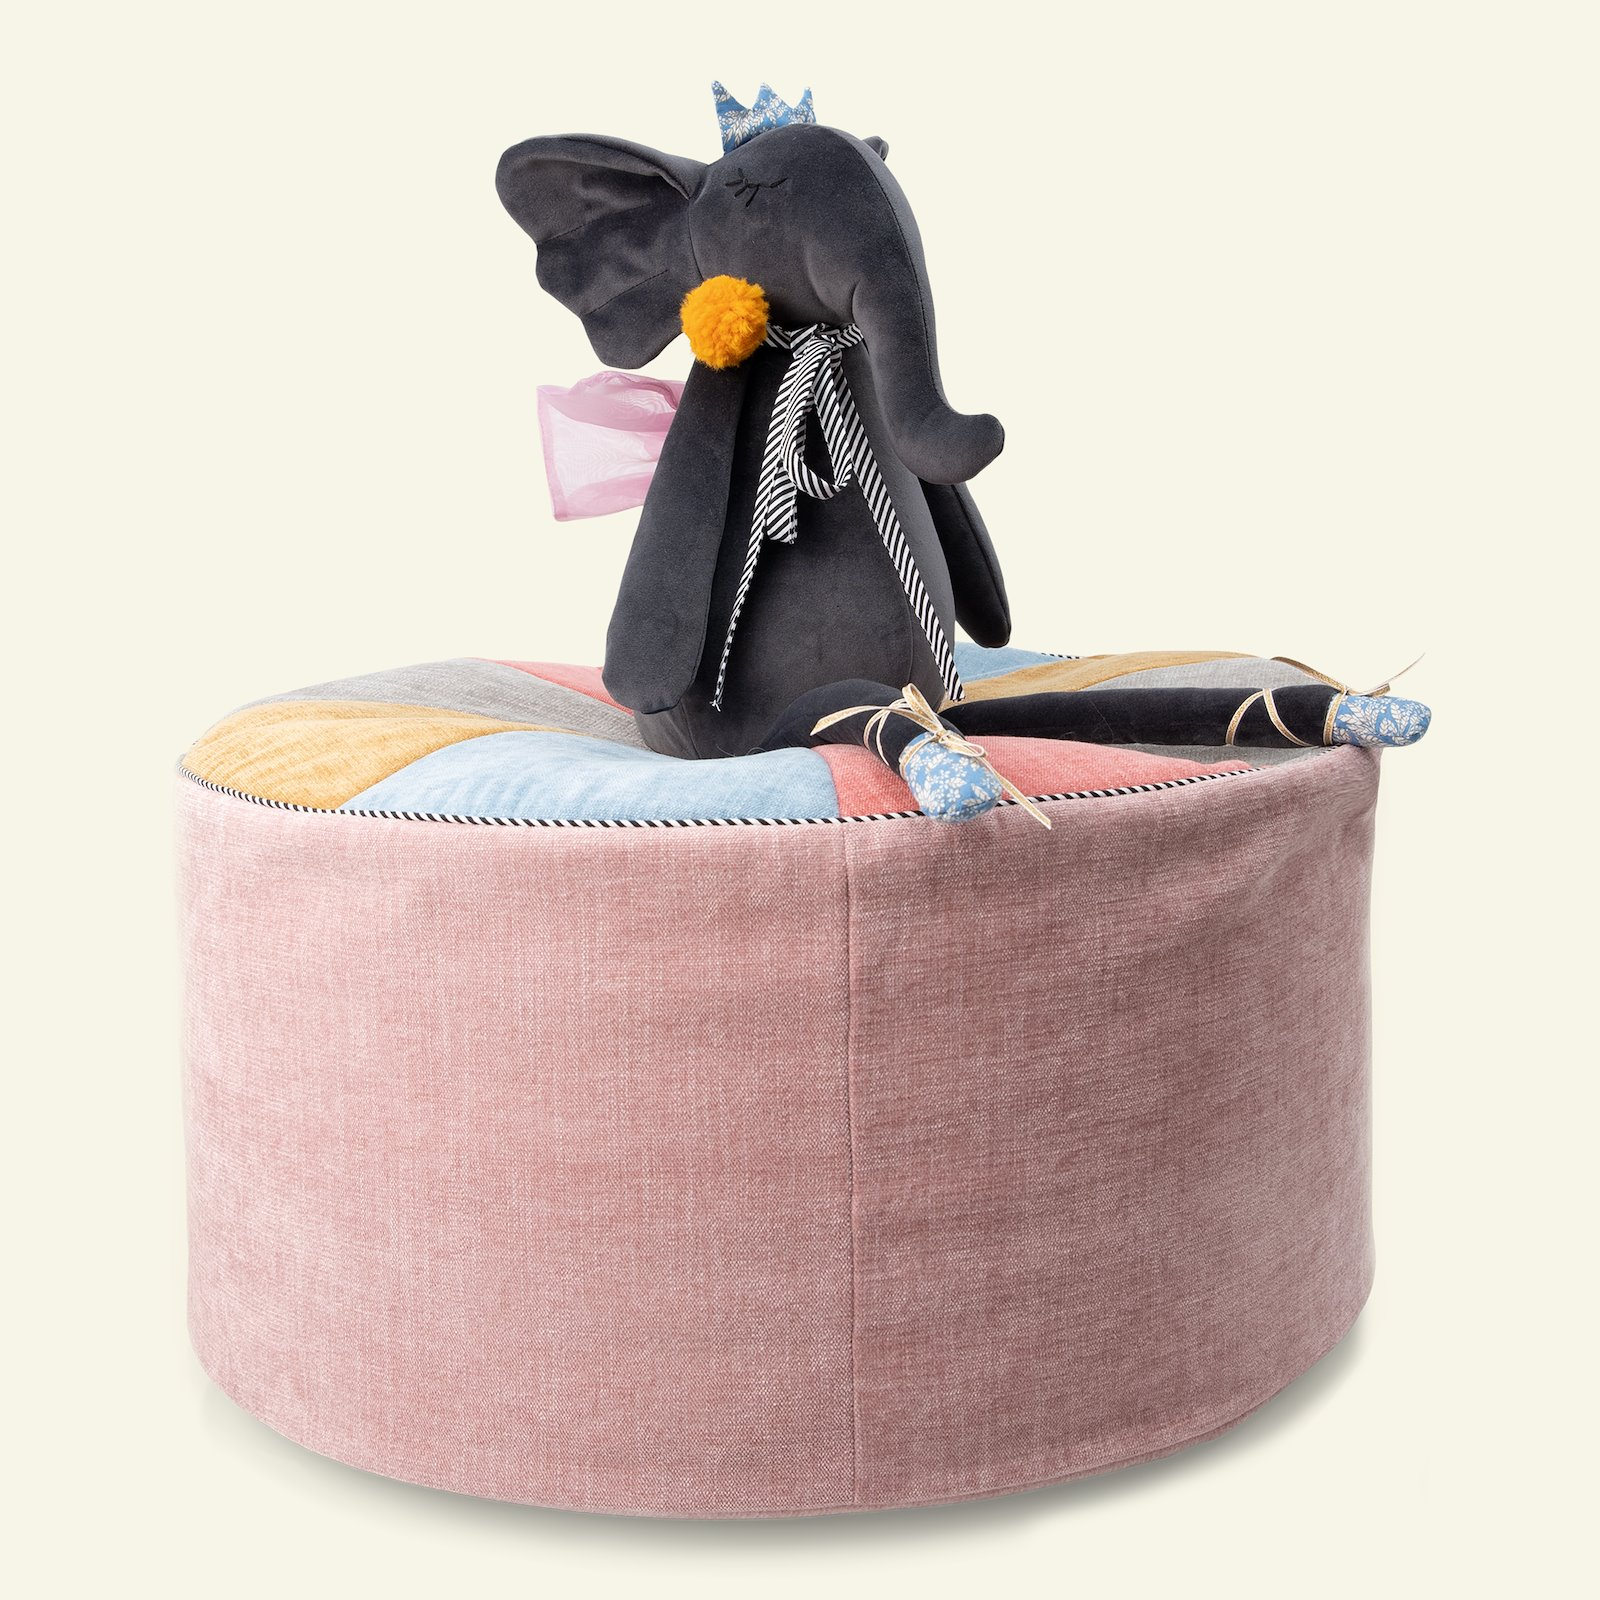 Upholstery shiny velvet grey p90314_823721_822363_631255_21462_64106_90054805_bundle